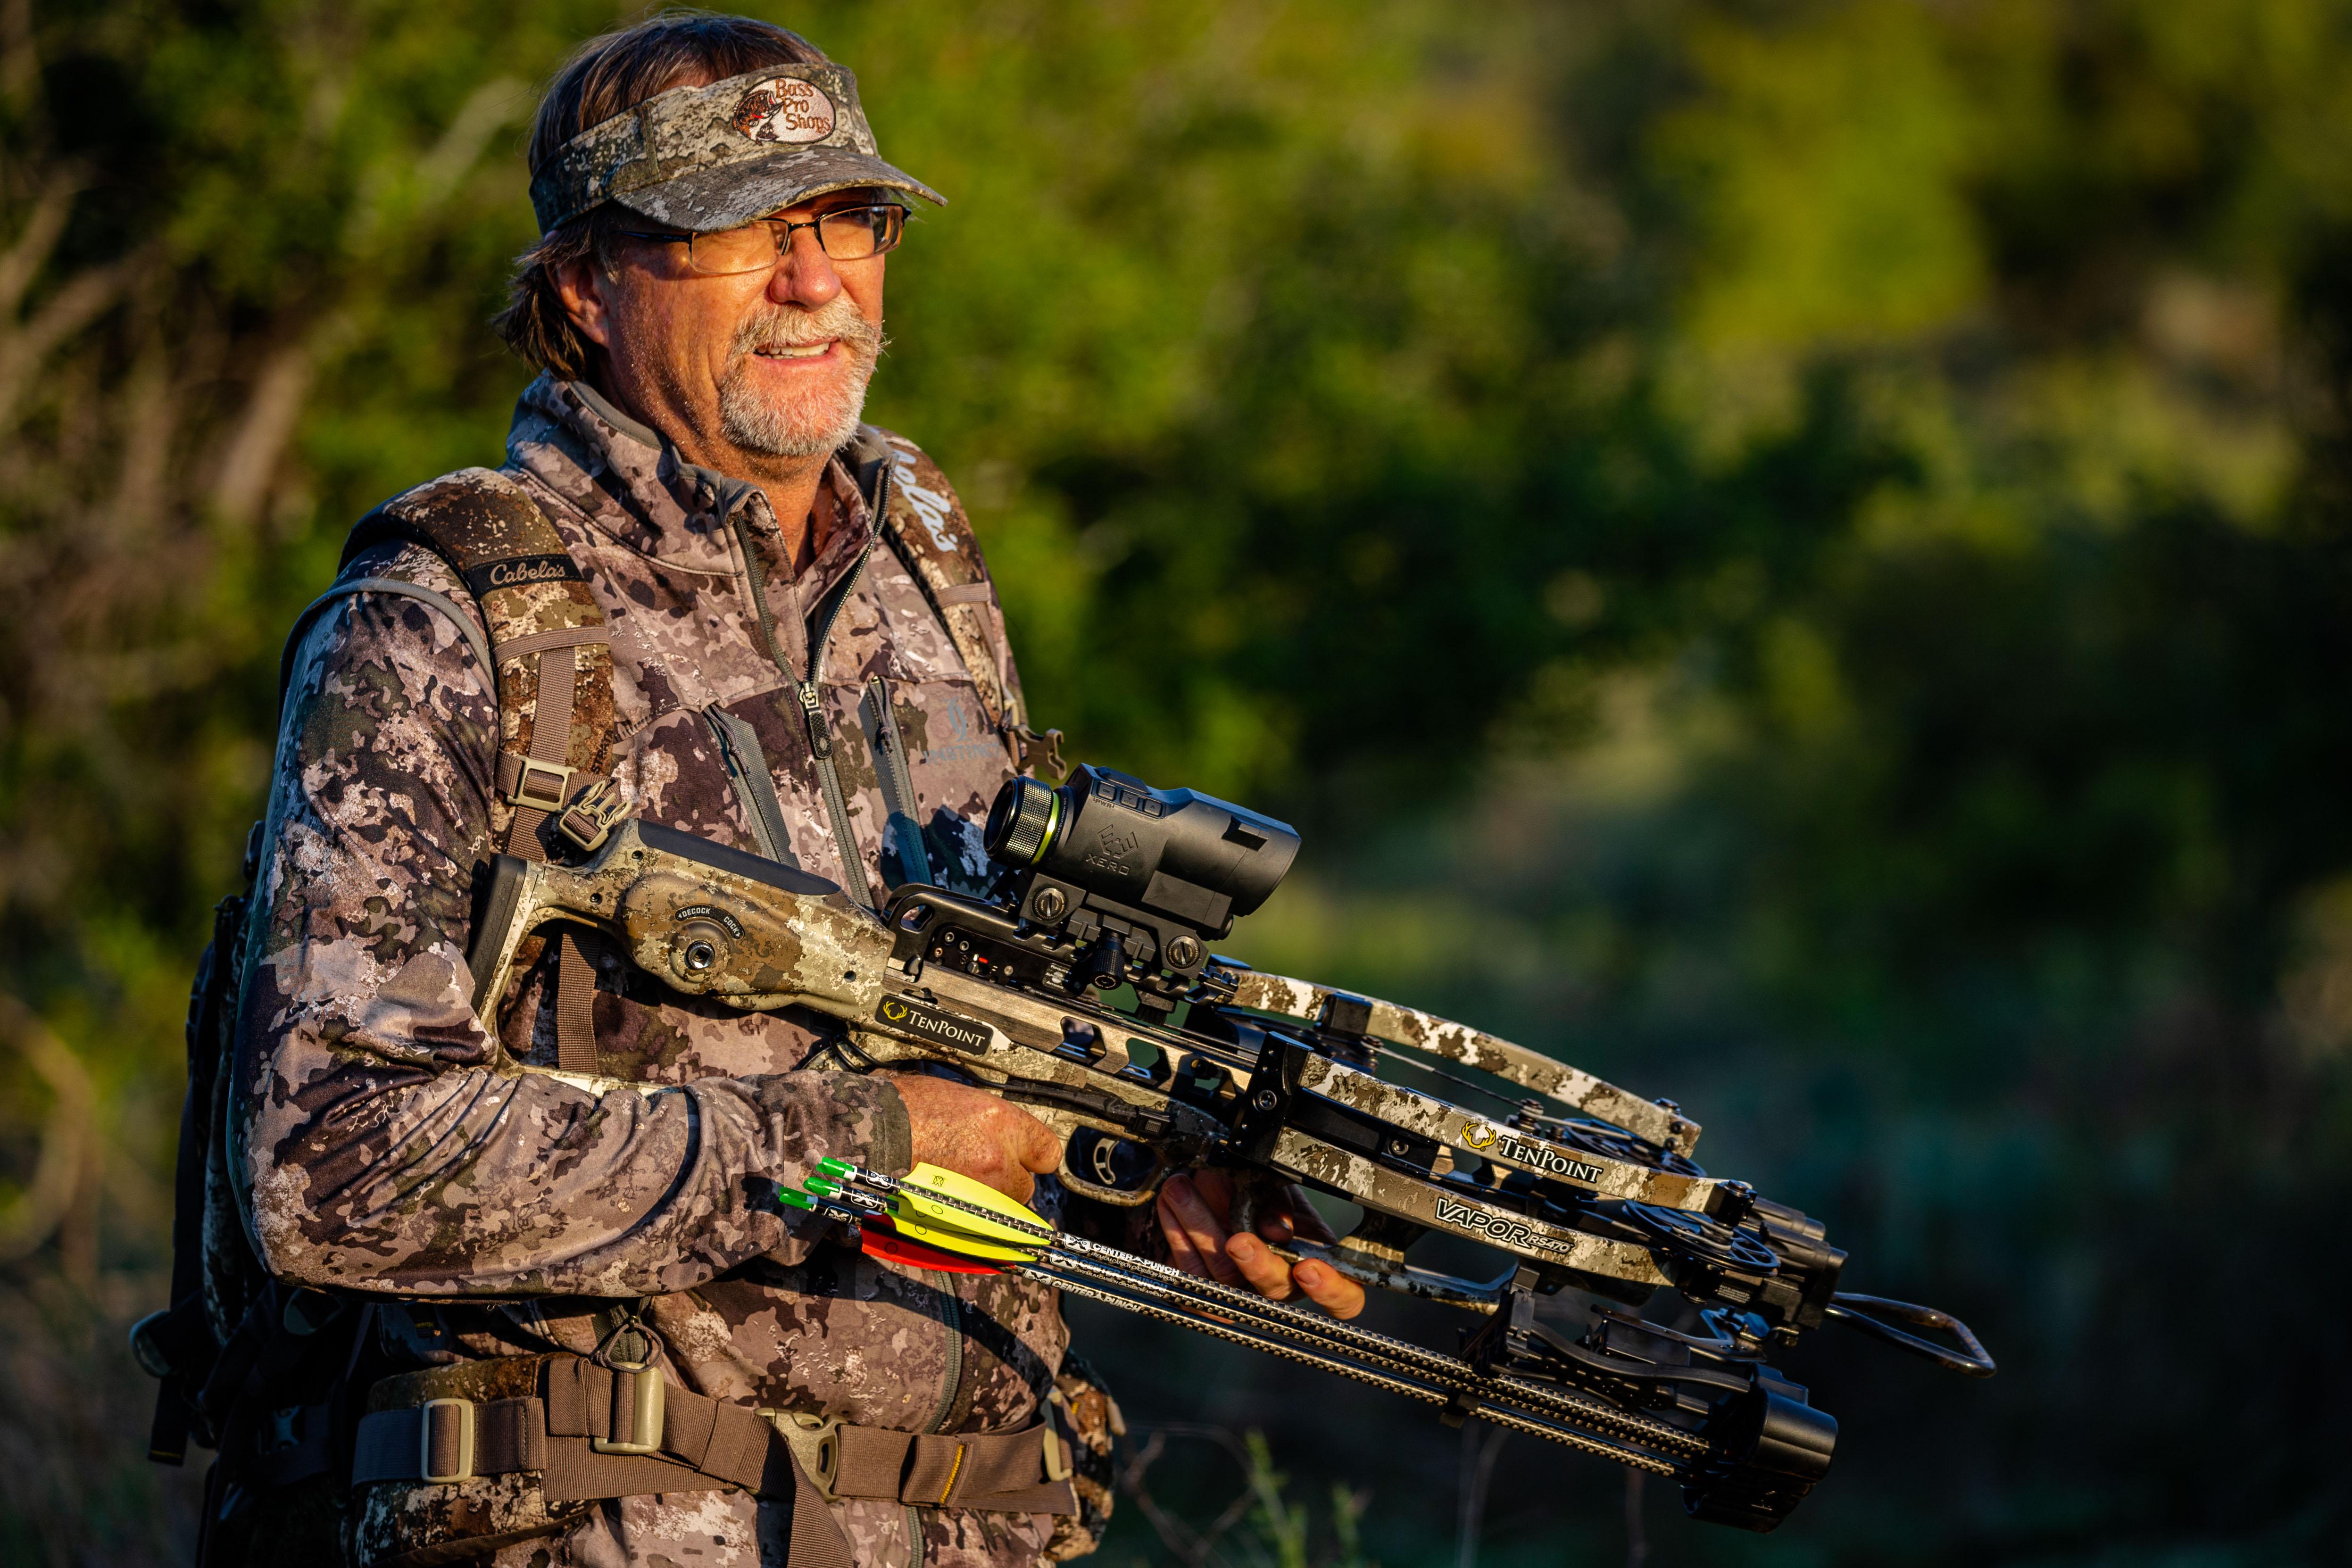 Hunting holding the Vapor RS470 Xero